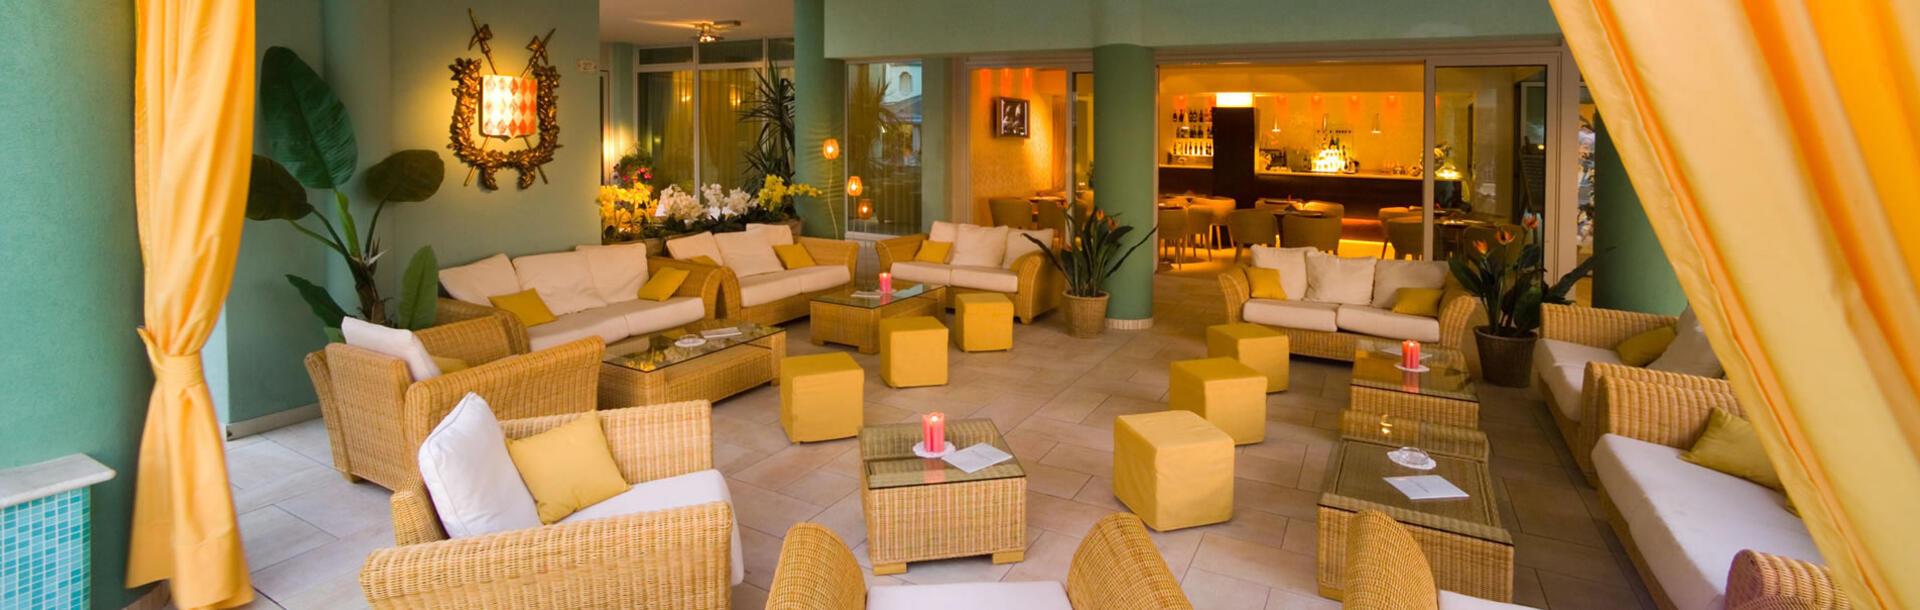 hotel-montecarlo it videogallery 013